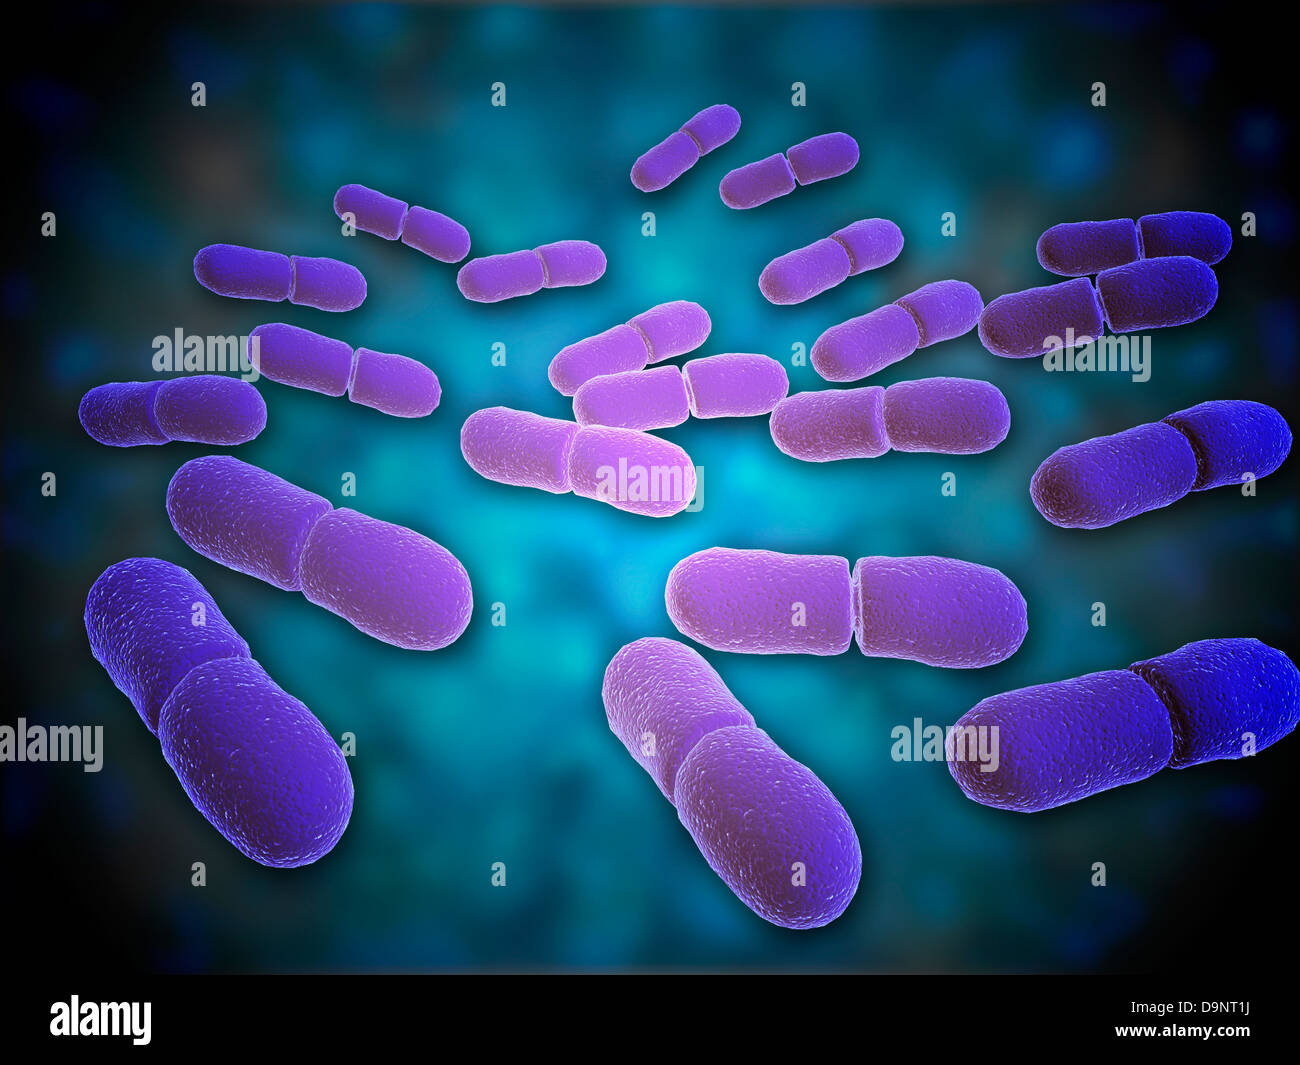 Listeria Monocytogenes Bacteria Stock Photos & Listeria ...